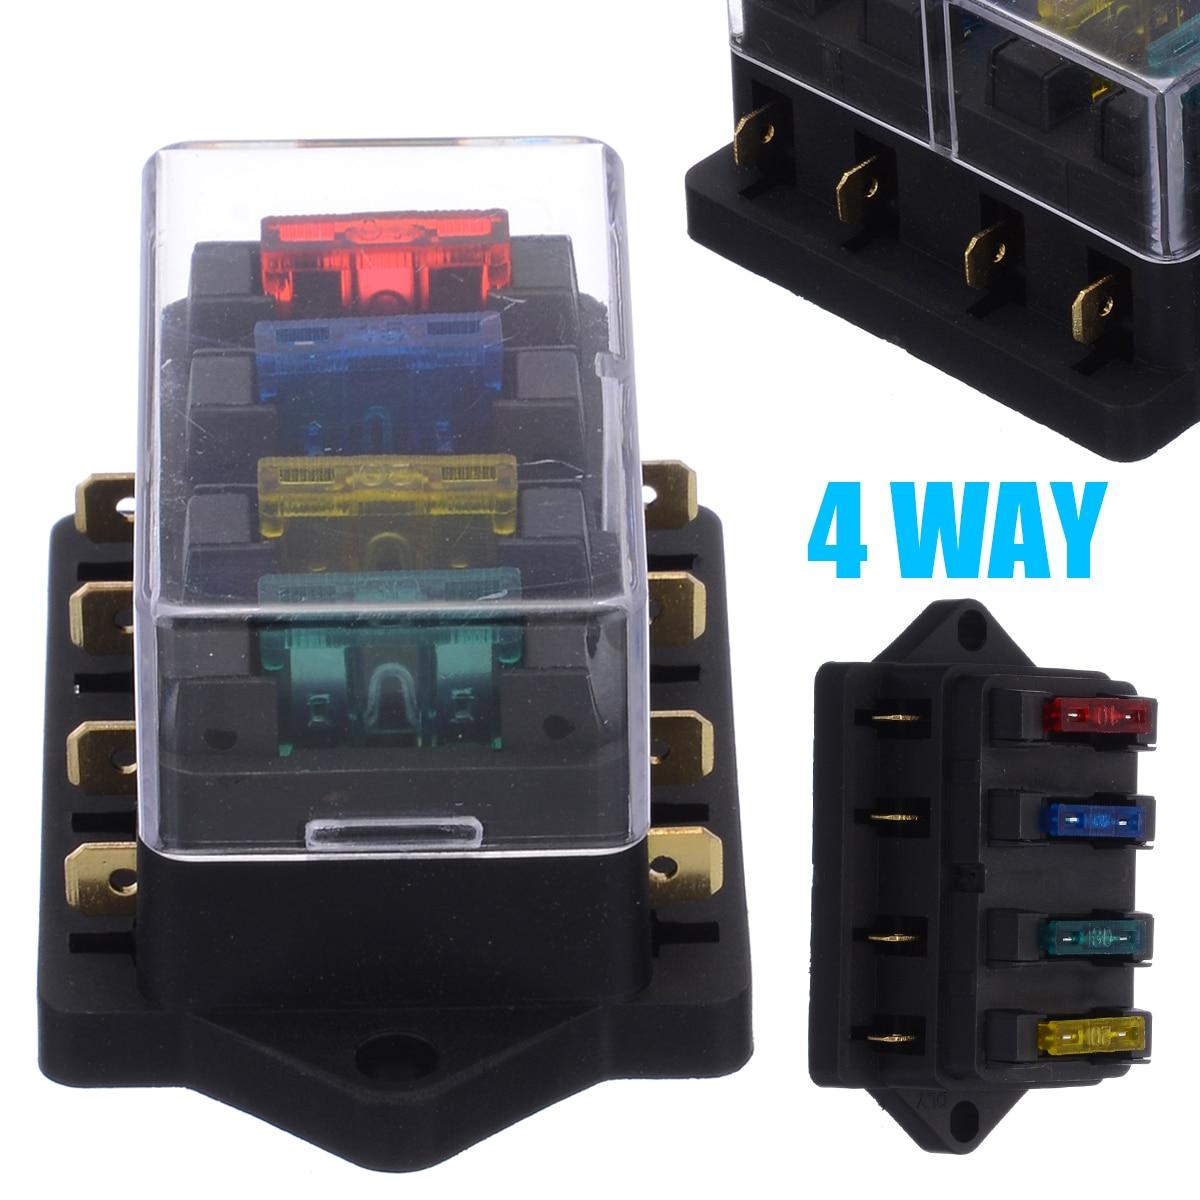 1pcs 4 Way Fuse Box DC 12V 24V 40A Circuit Car Trailer Auto Blade Fuse Box Block Holder ATC ATO Fuse Holder with 4 Fuse